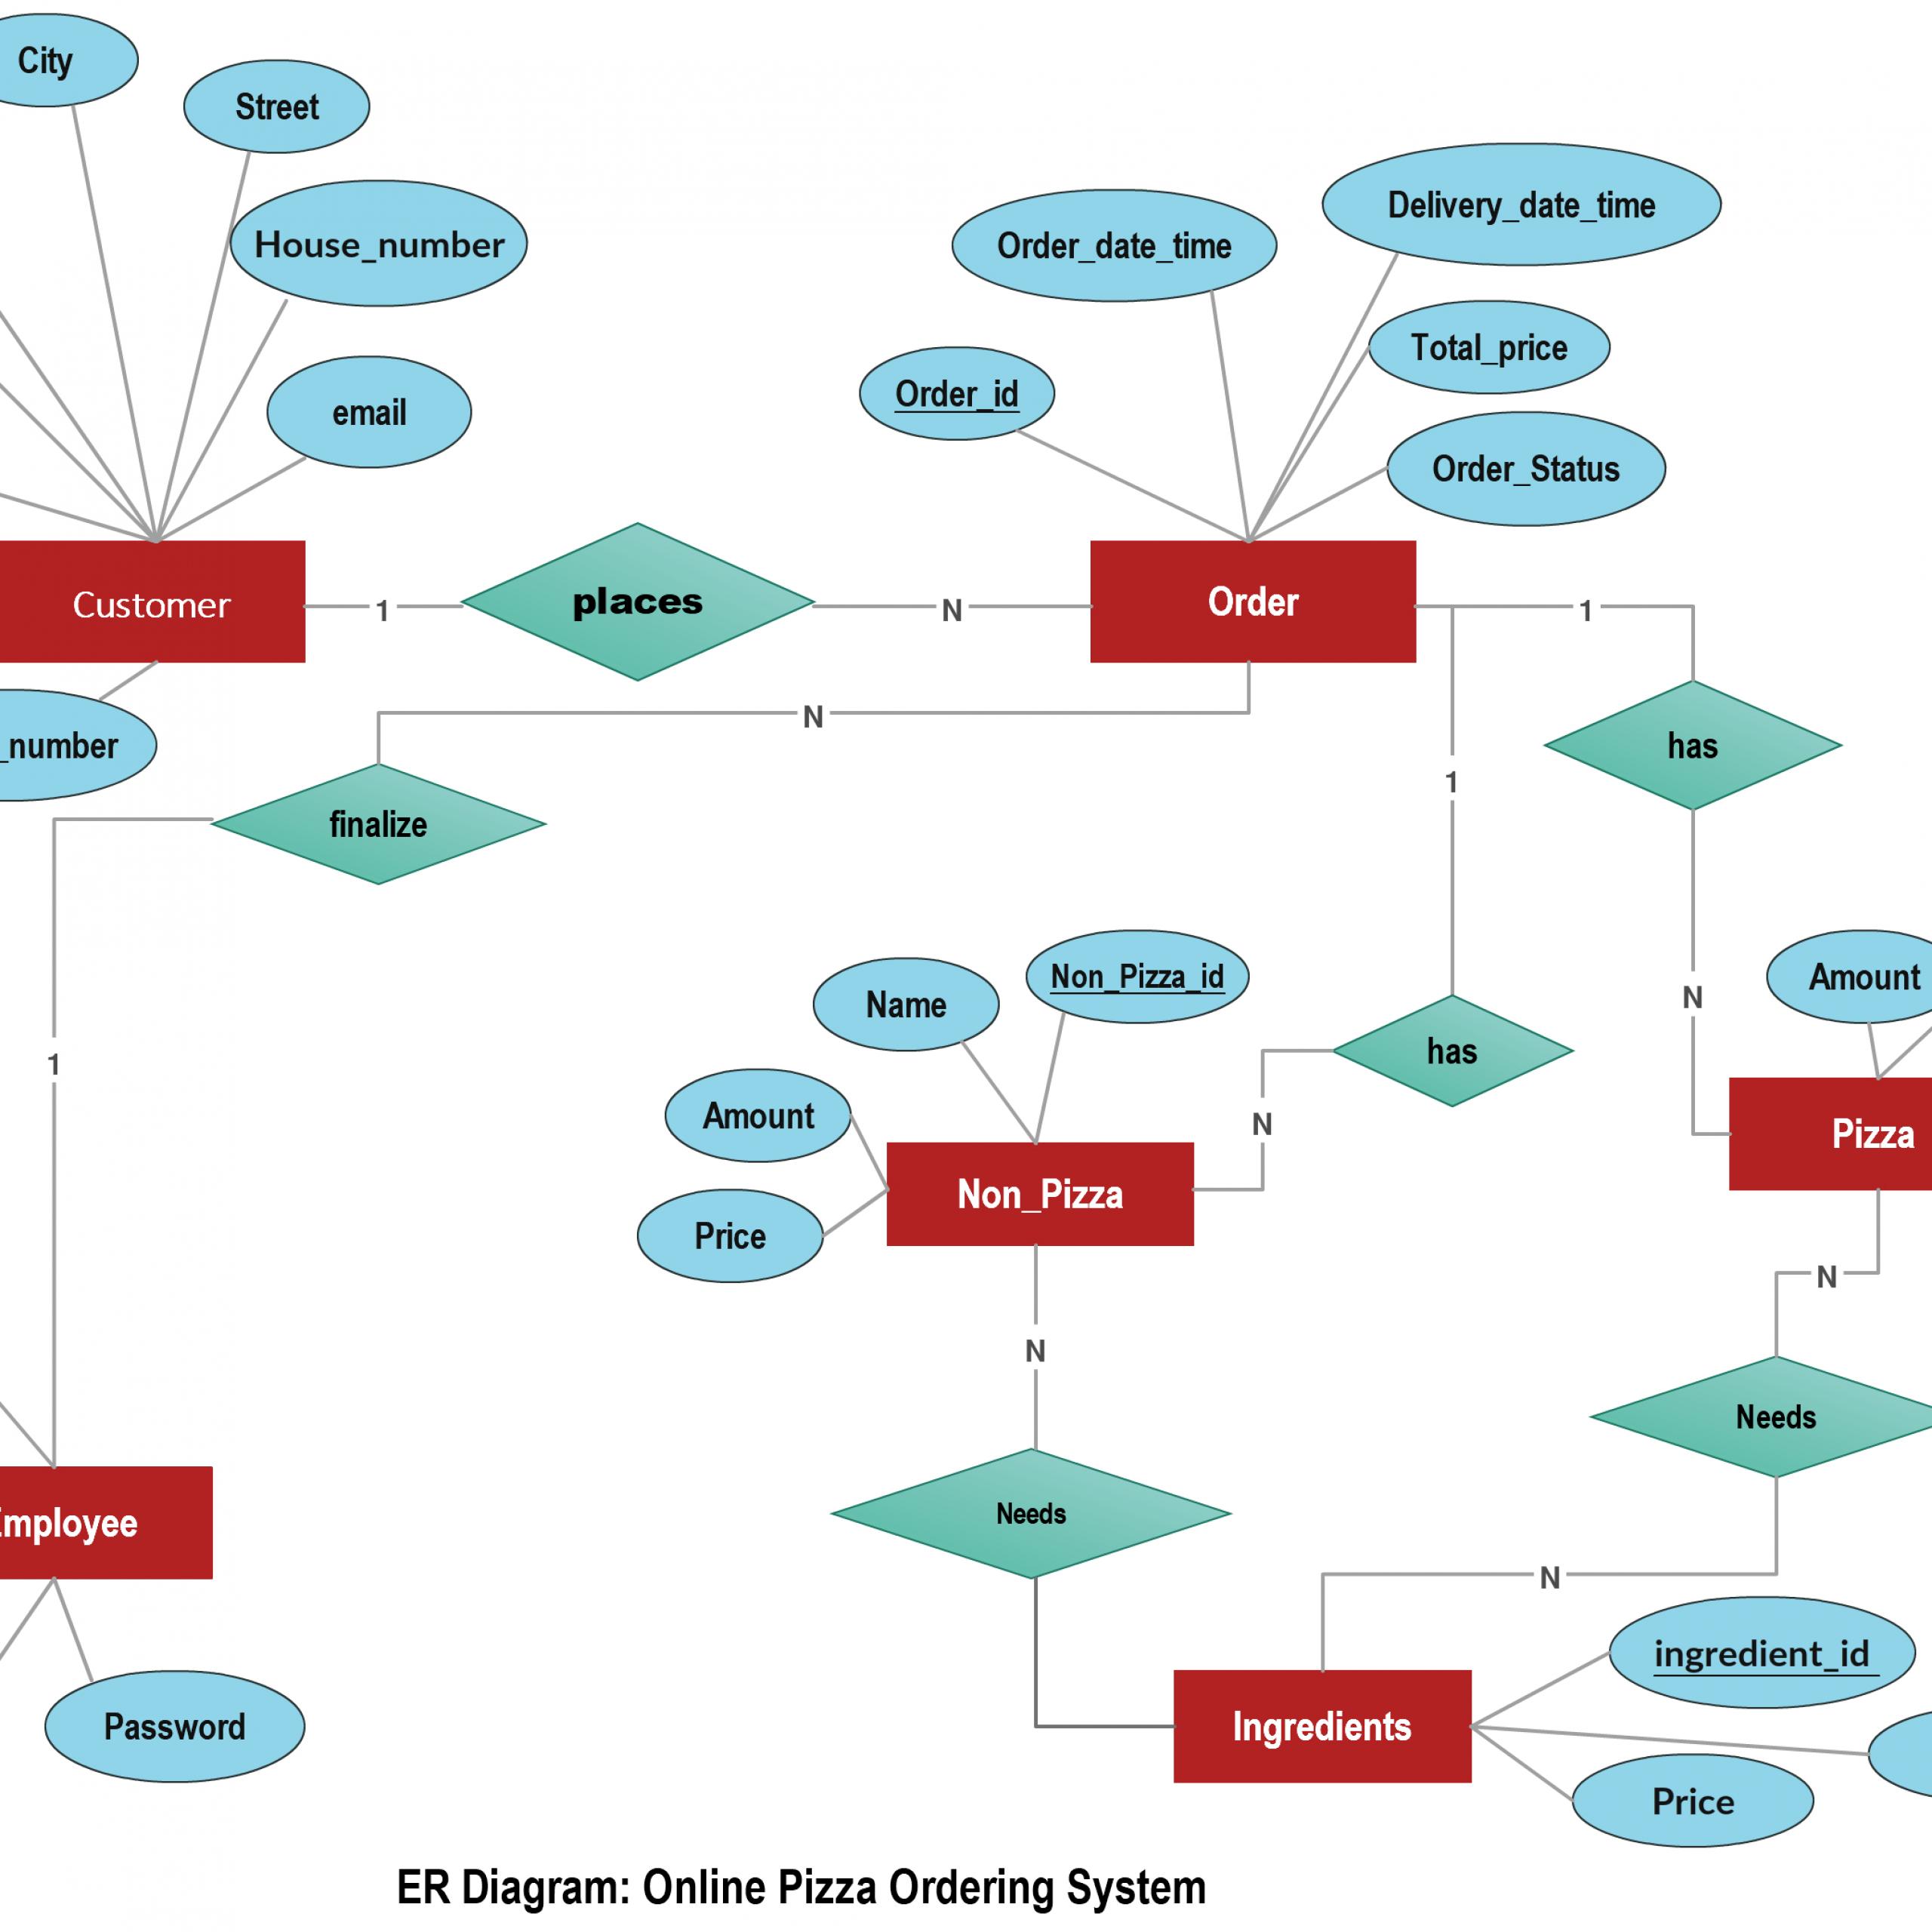 Online Pizza Ordering System Illustrated Using An Er Diagram for Make Erd Diagram Online